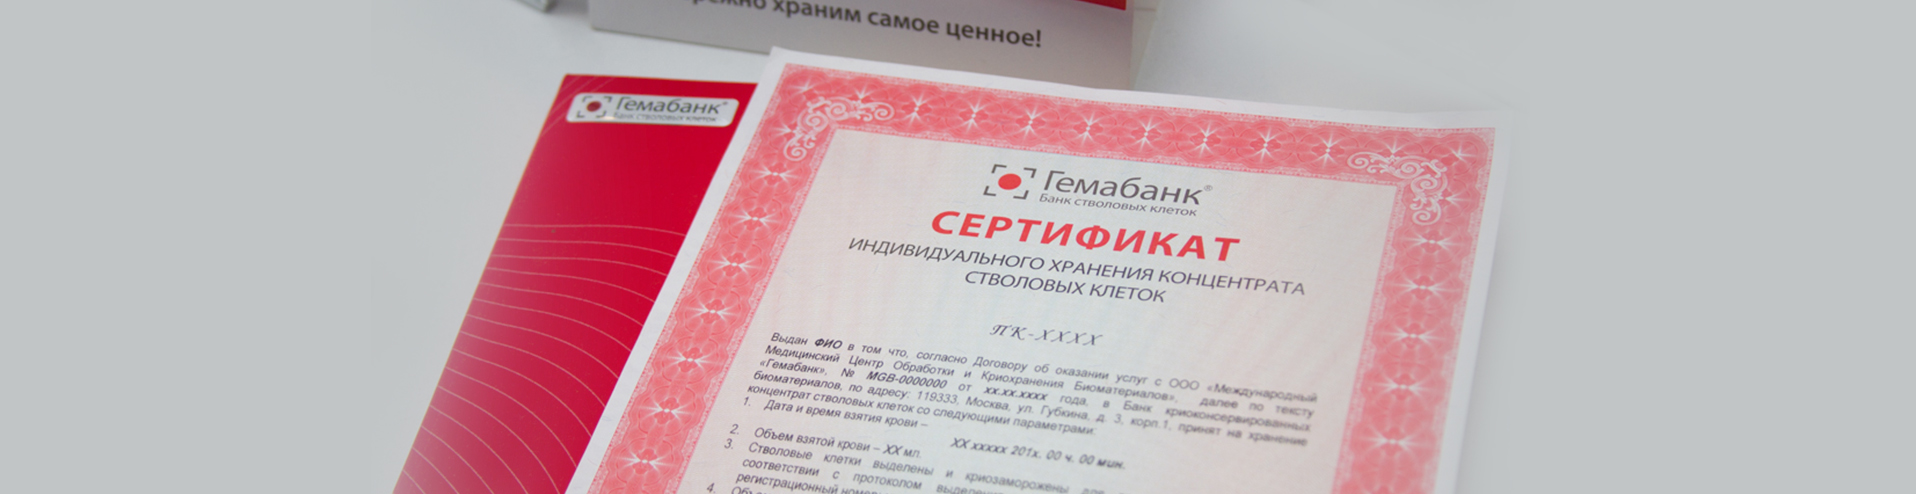 140818_sertifikati